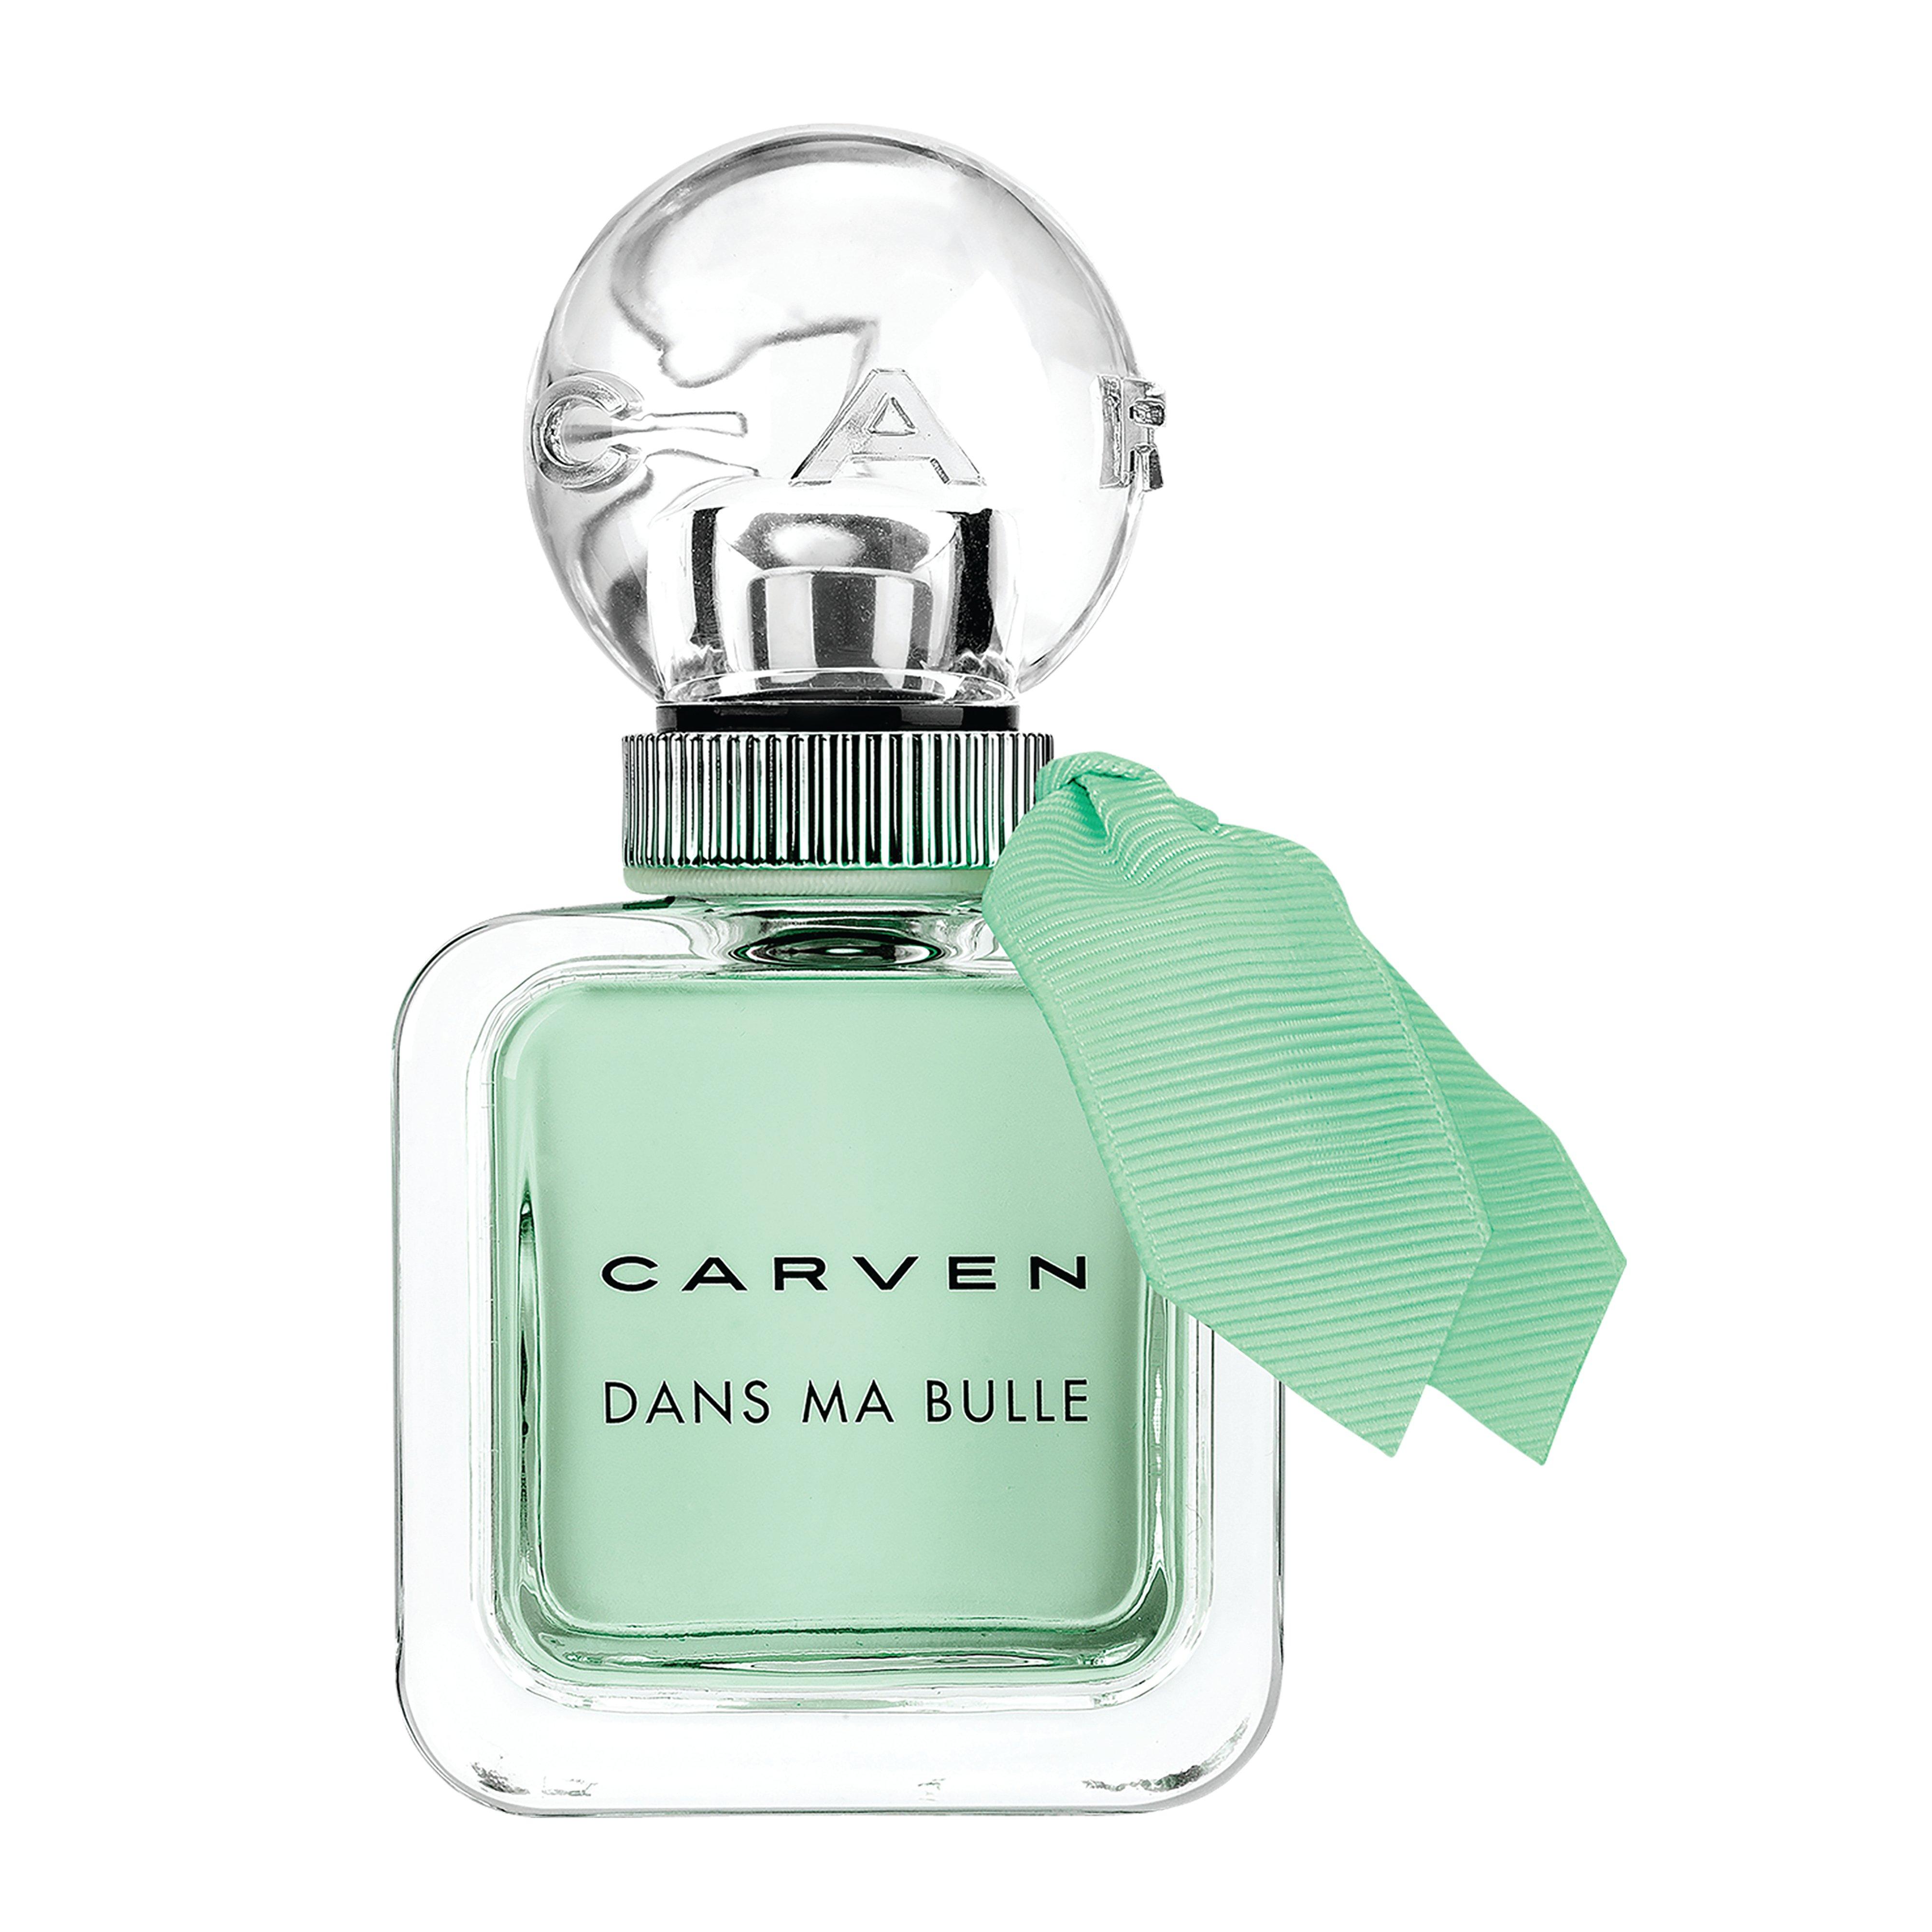 Carven - Dans Ma Bulle EDT 30 ml